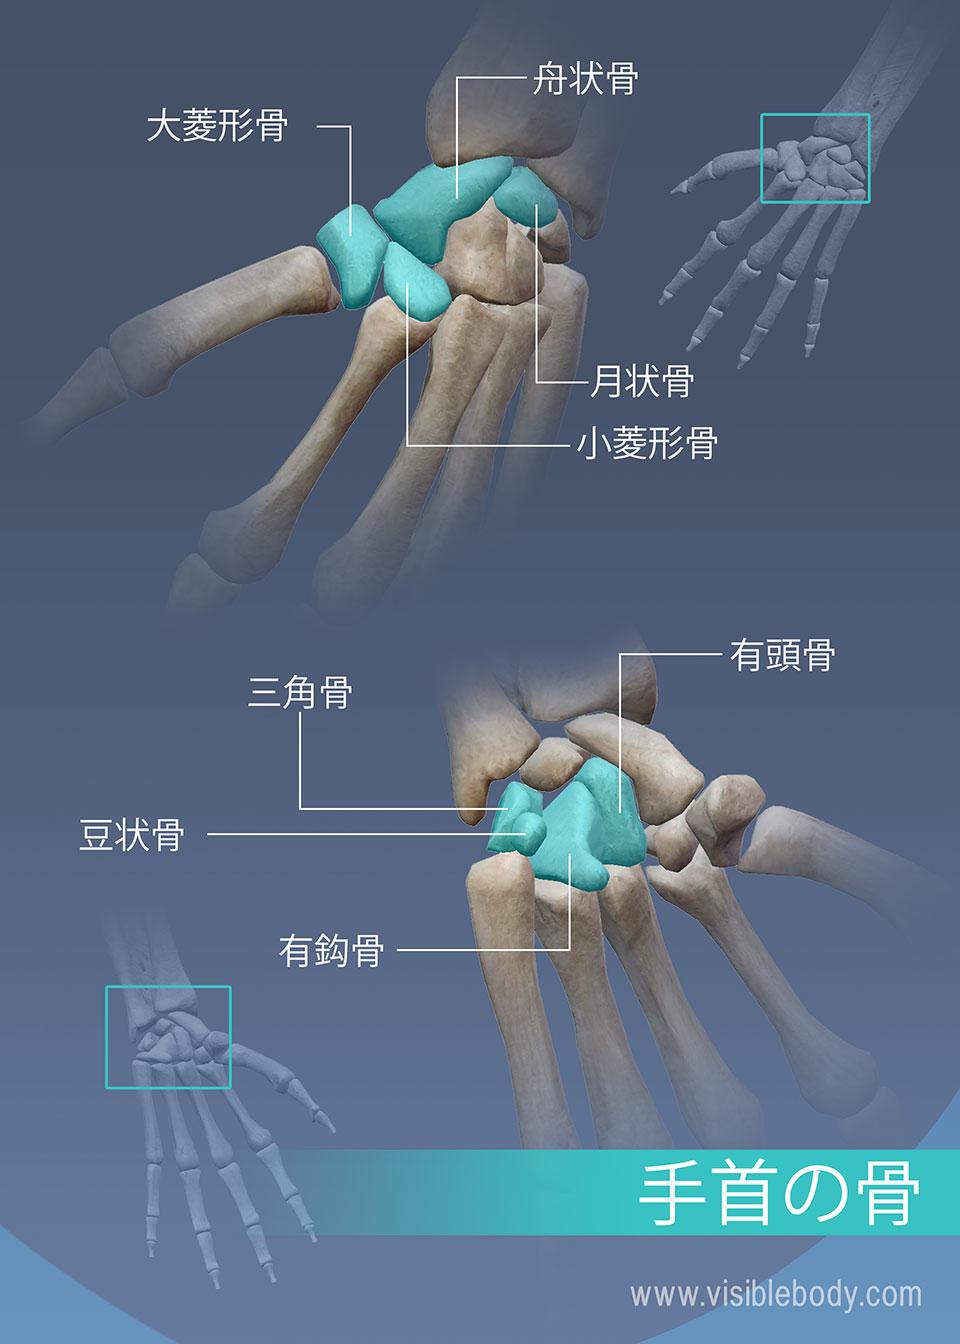 大菱形骨、舟状骨、月状骨、小菱形骨、有頭骨、三角骨、豆状骨、および有鈎骨手首の骨